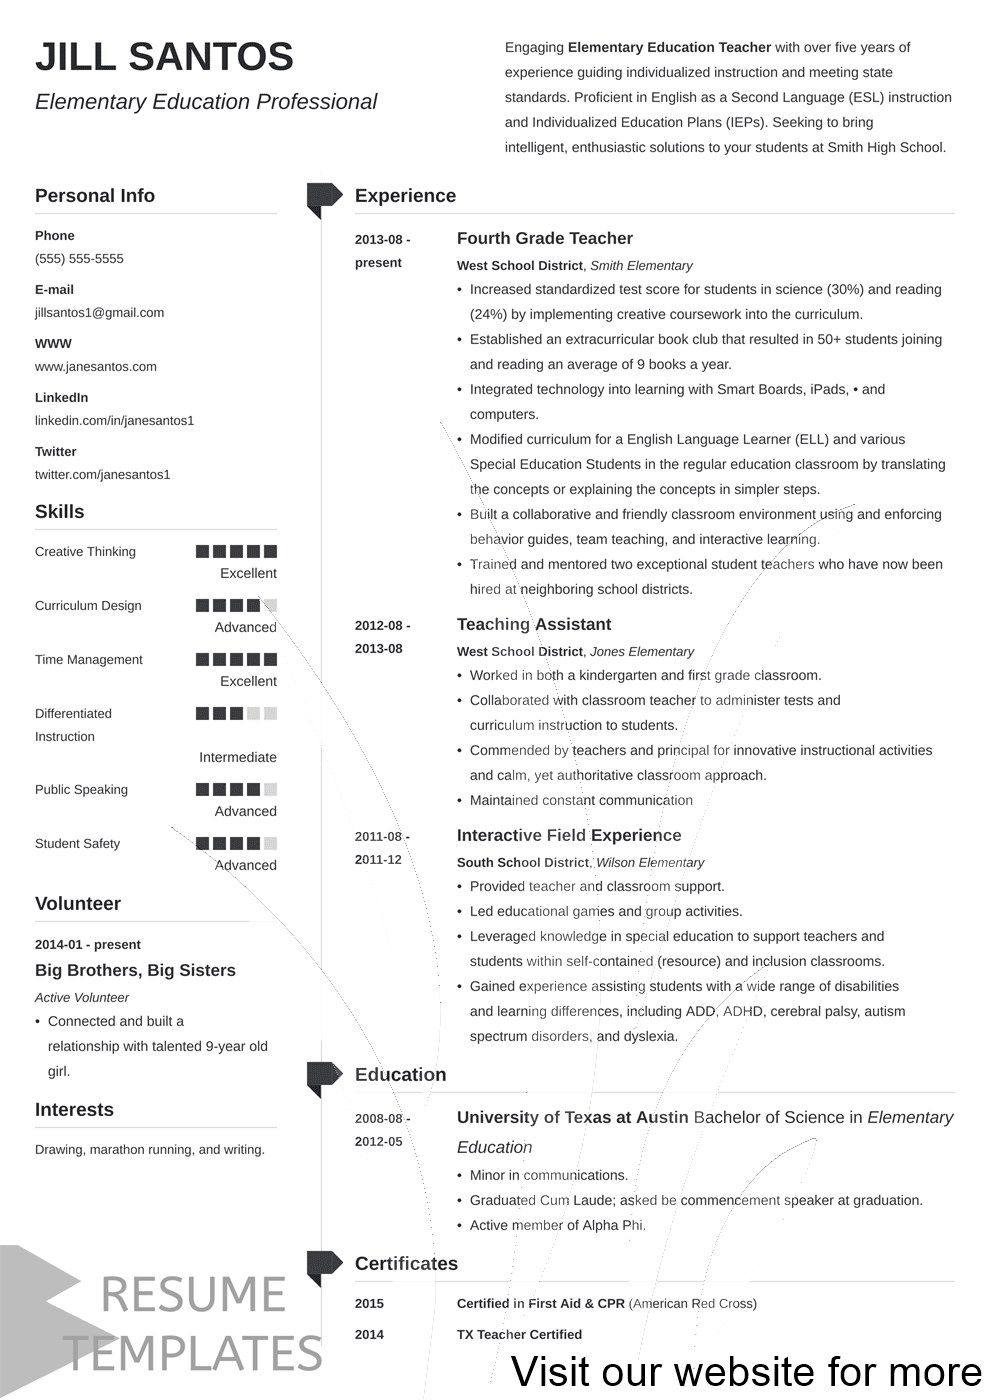 Best cv resume template psd in 2020 Resume template